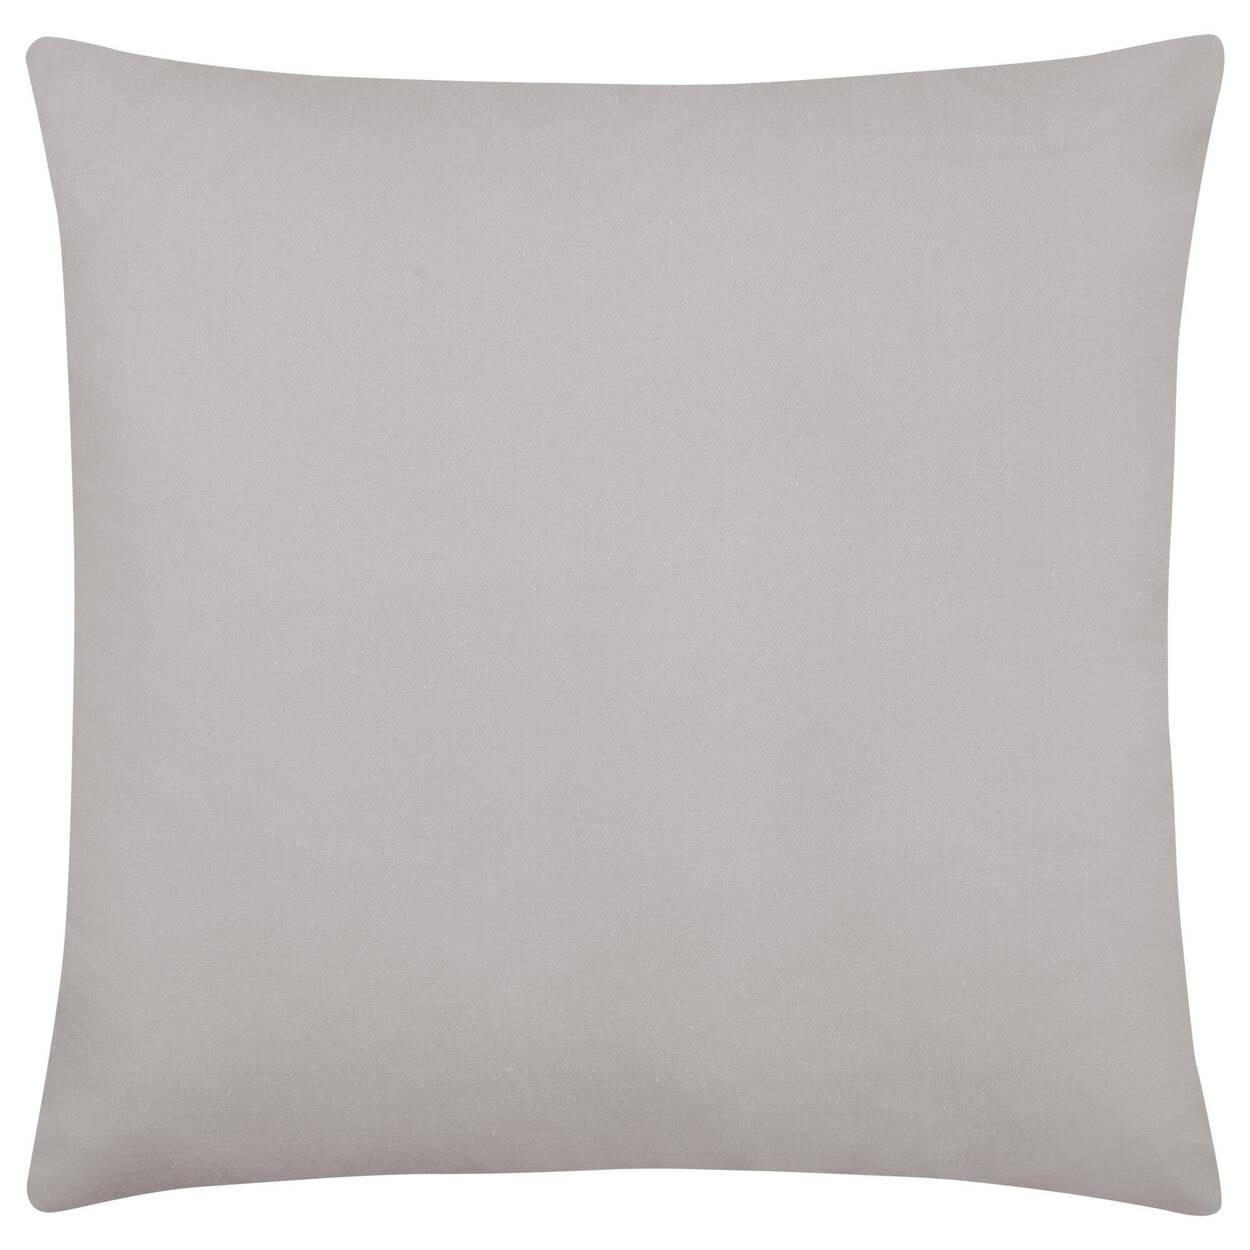 "Luvenia Decorative Pillow 18"" x 18"""